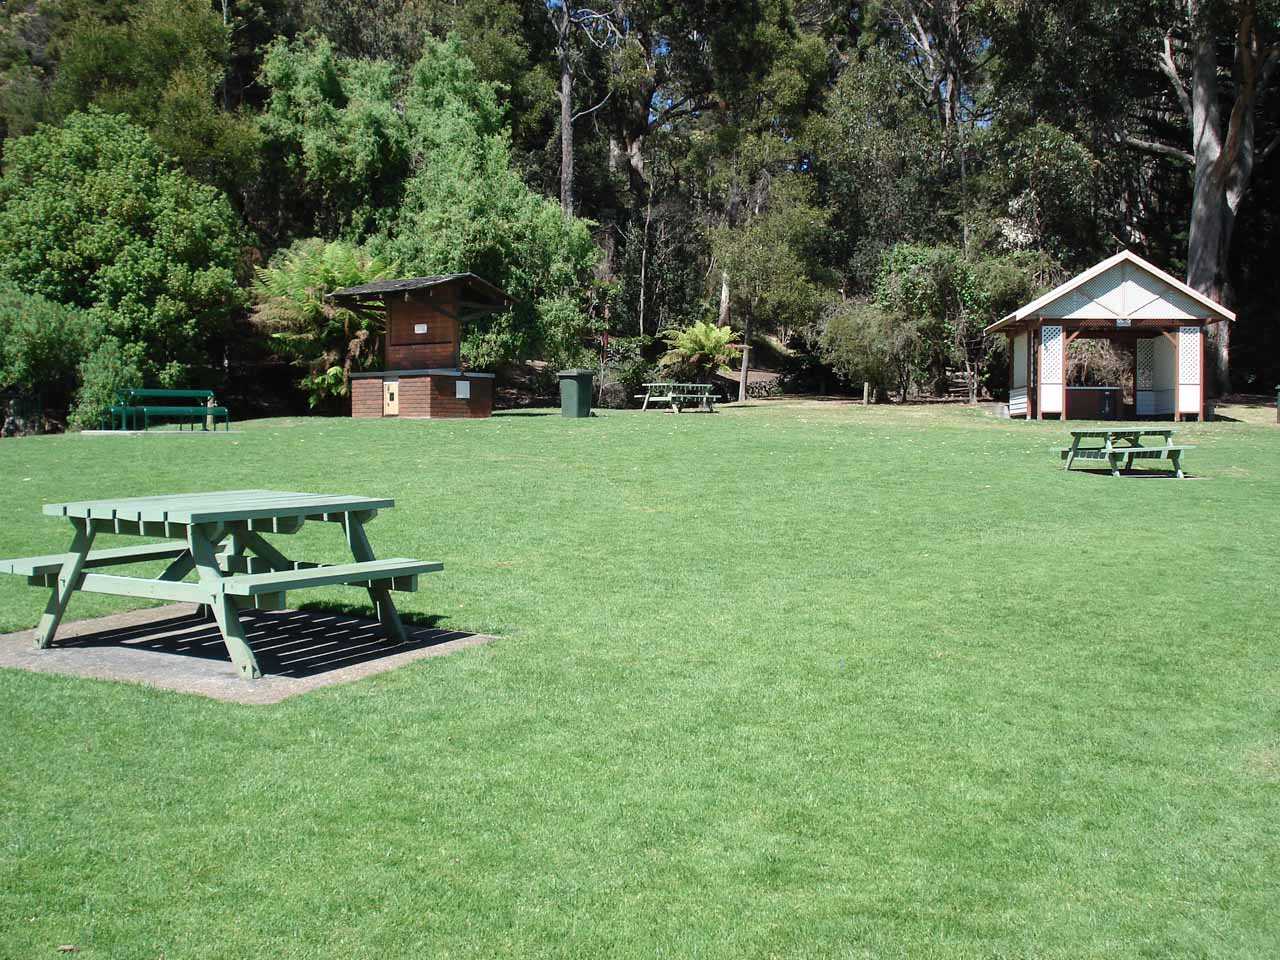 Picnic area at the Burnie Park